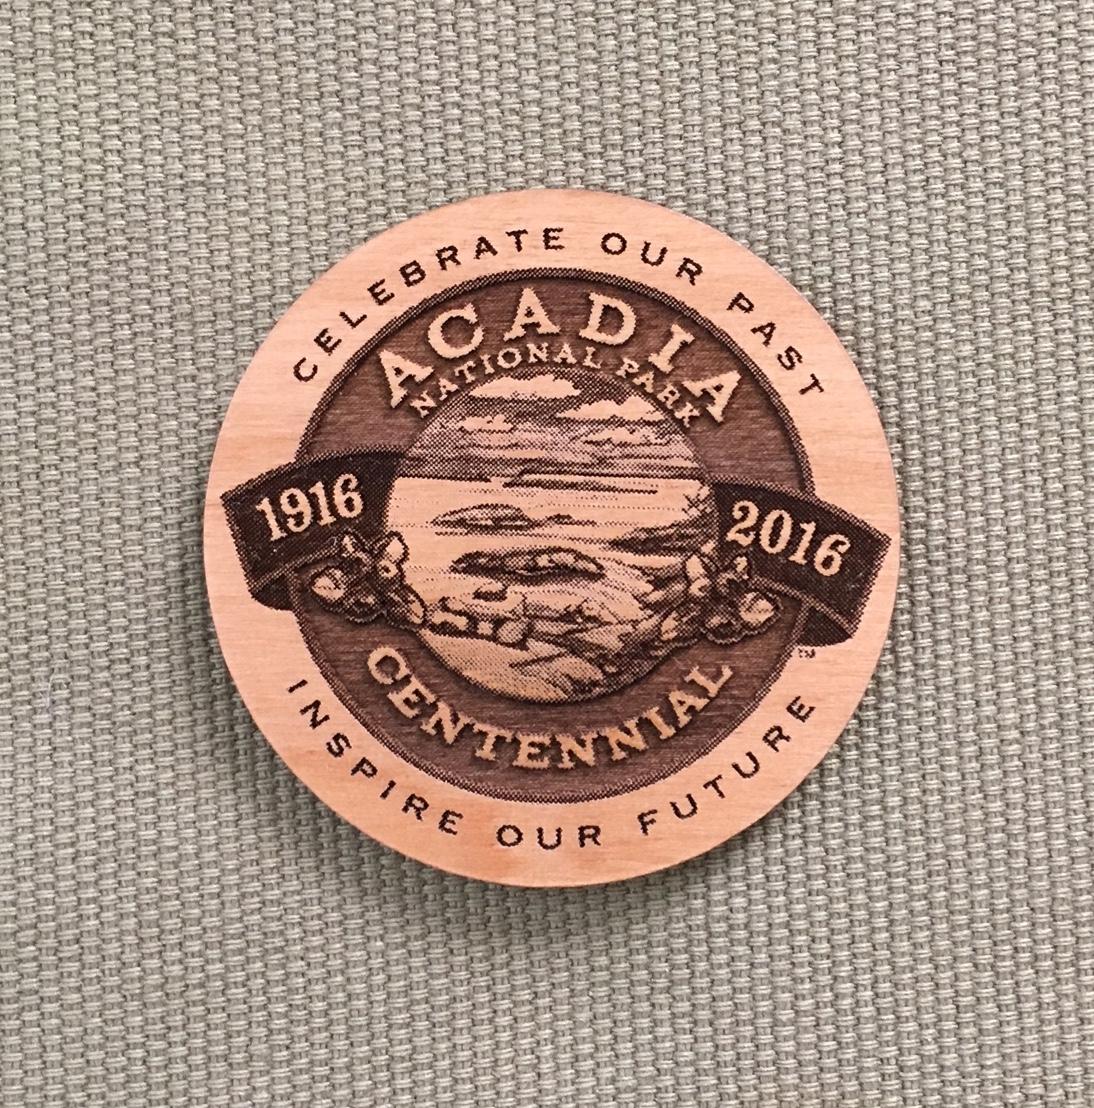 Acadia National Park Centennial